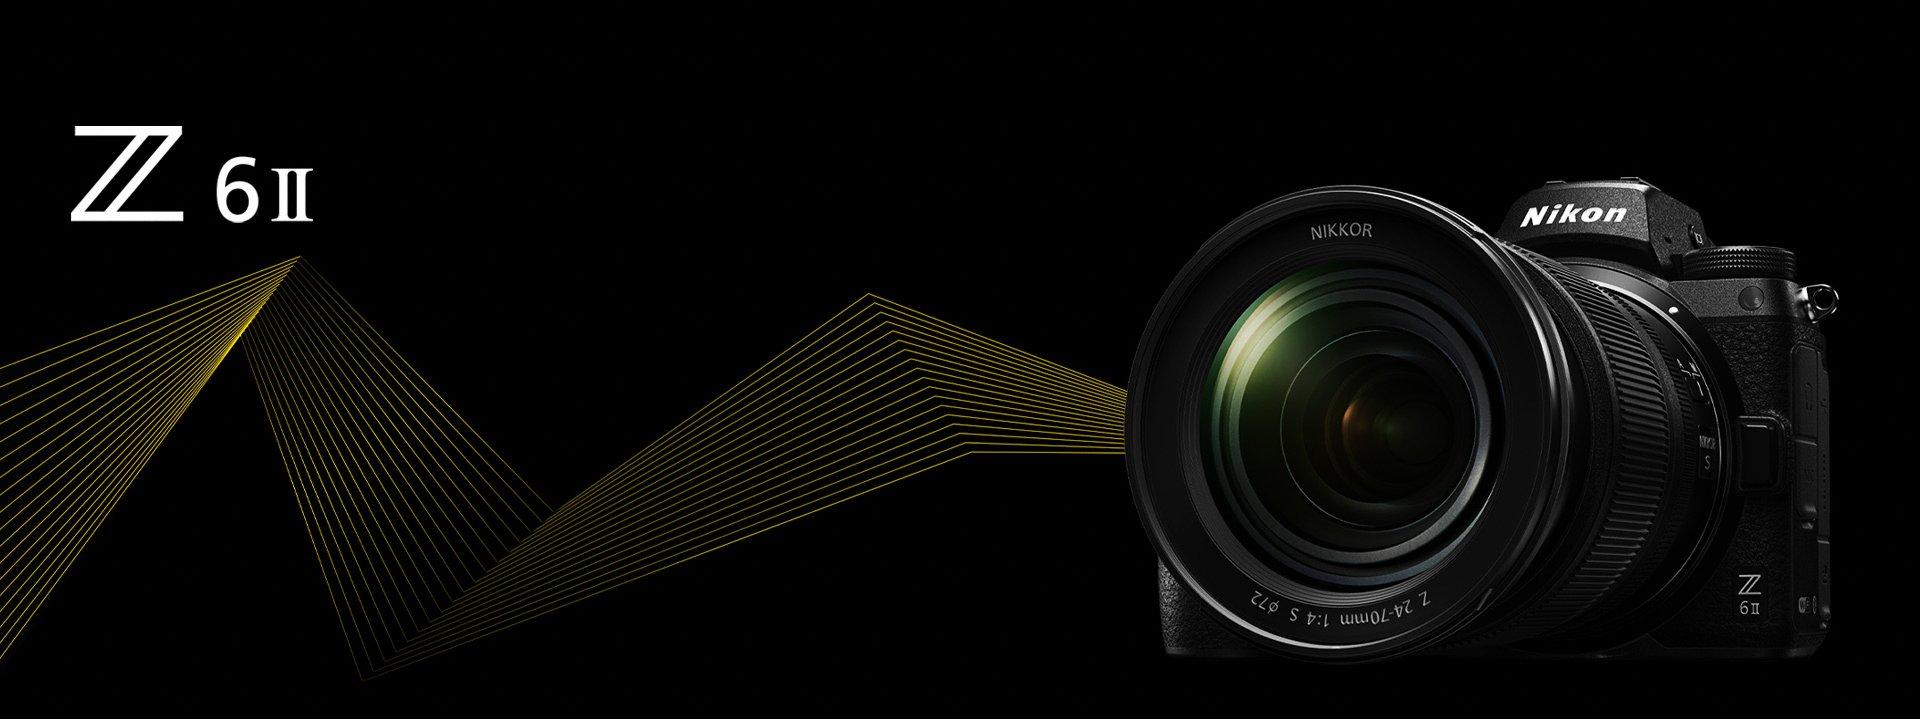 Nikon Z6 II video